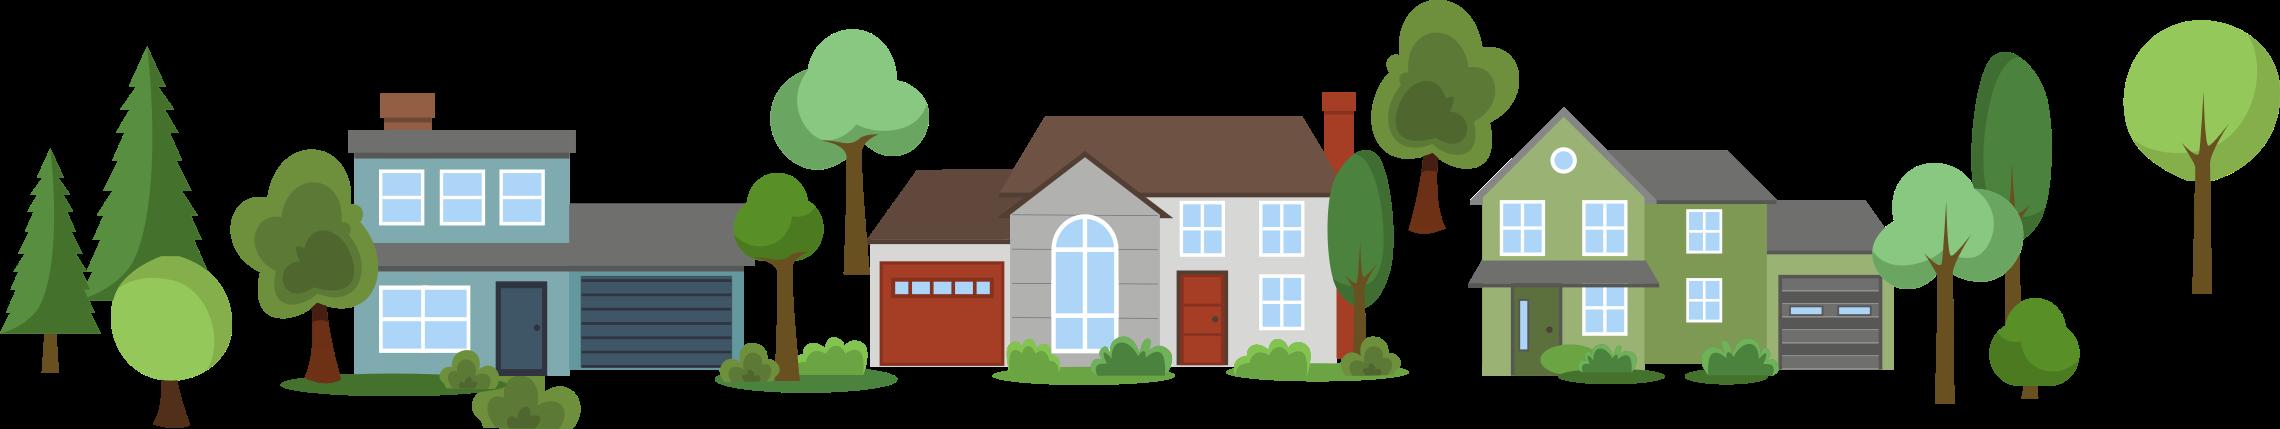 Elvehjem is a family. Neighborhood clipart housing estate